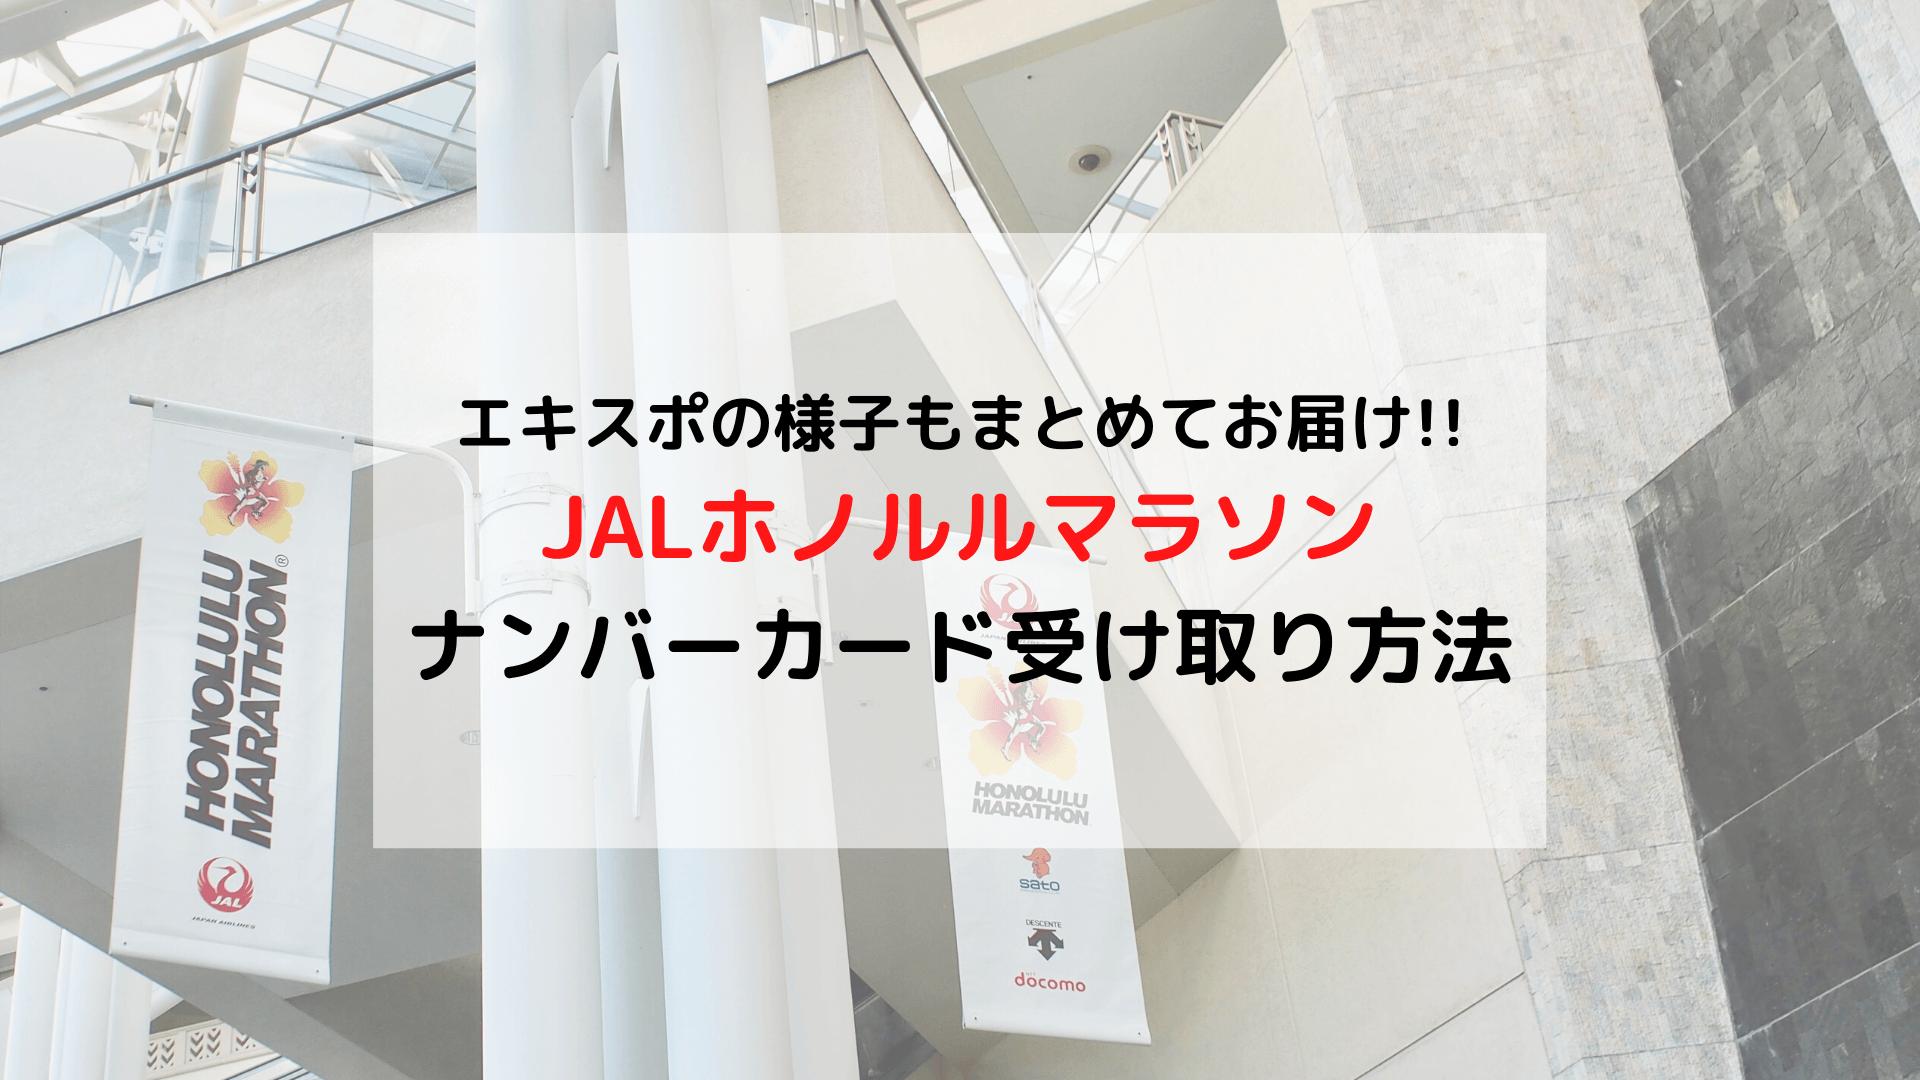 JALホノルルマラソン ナンバーカード(ゼッケン)の受け取り方法